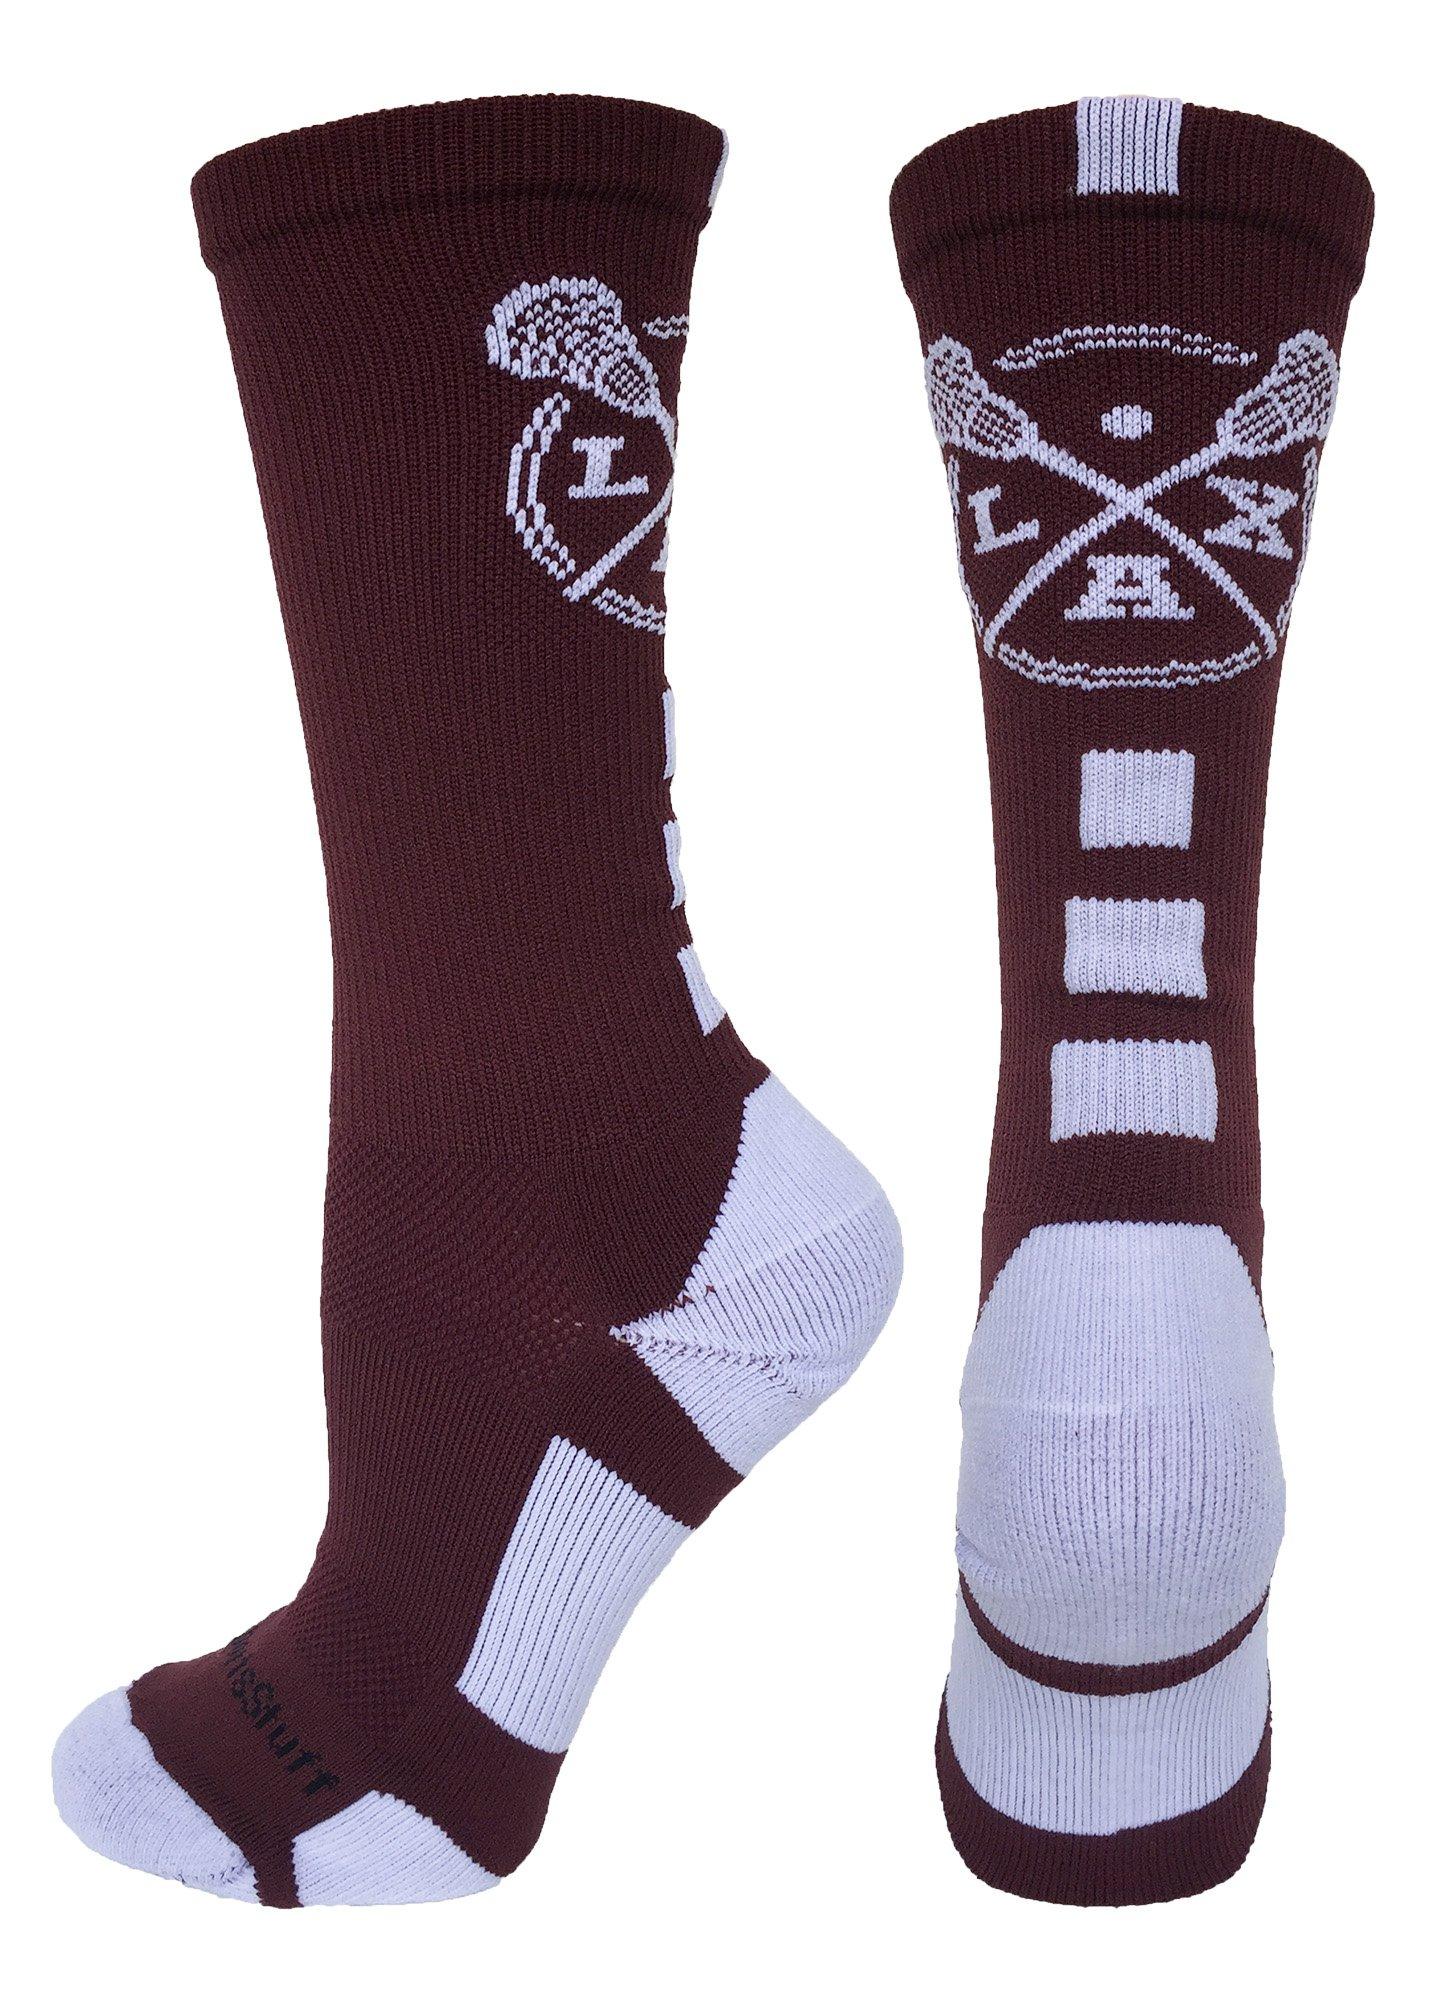 LAX Lacrosse Socks with Lacrosse Sticks Athletic Crew Socks (Maroon/White, Small) by MadSportsStuff